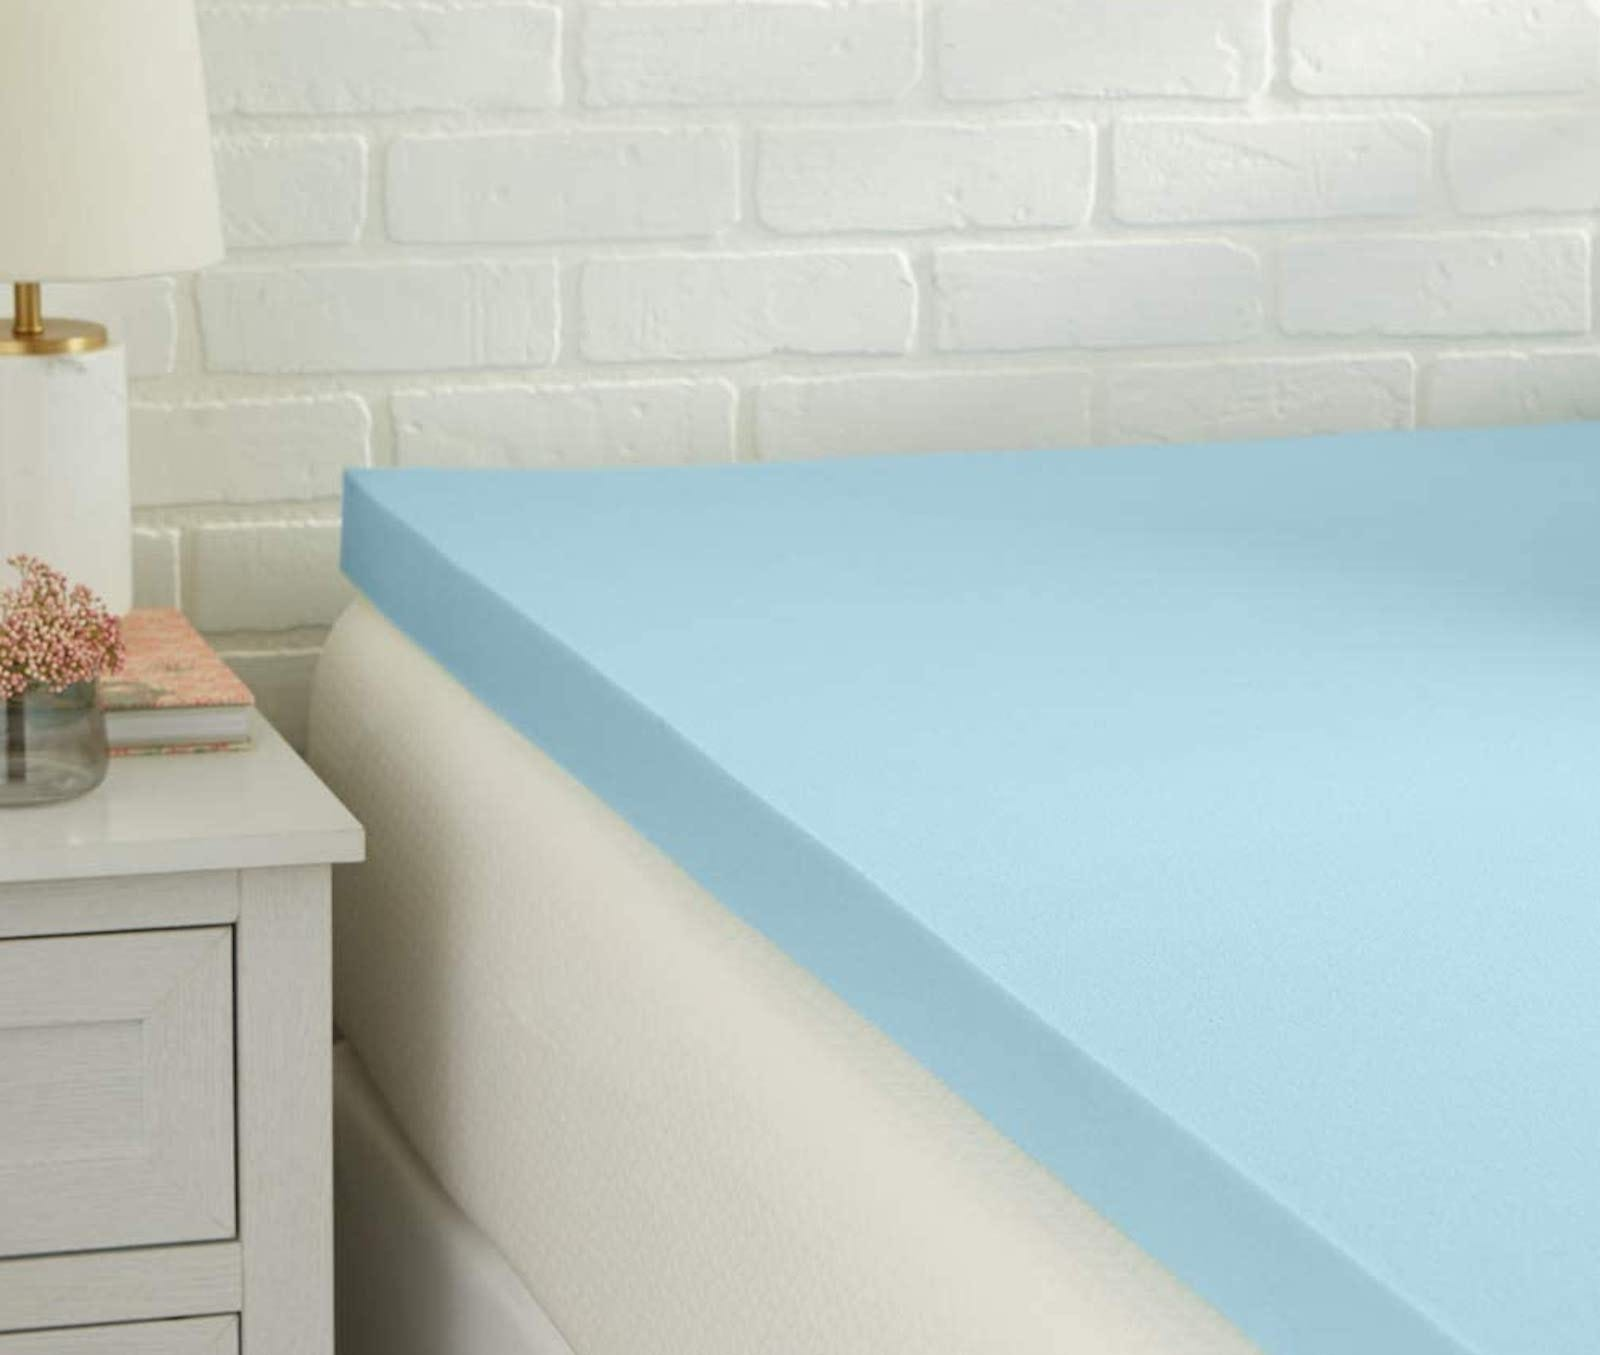 The corner of a blue foam mattress topper atop a white mattress